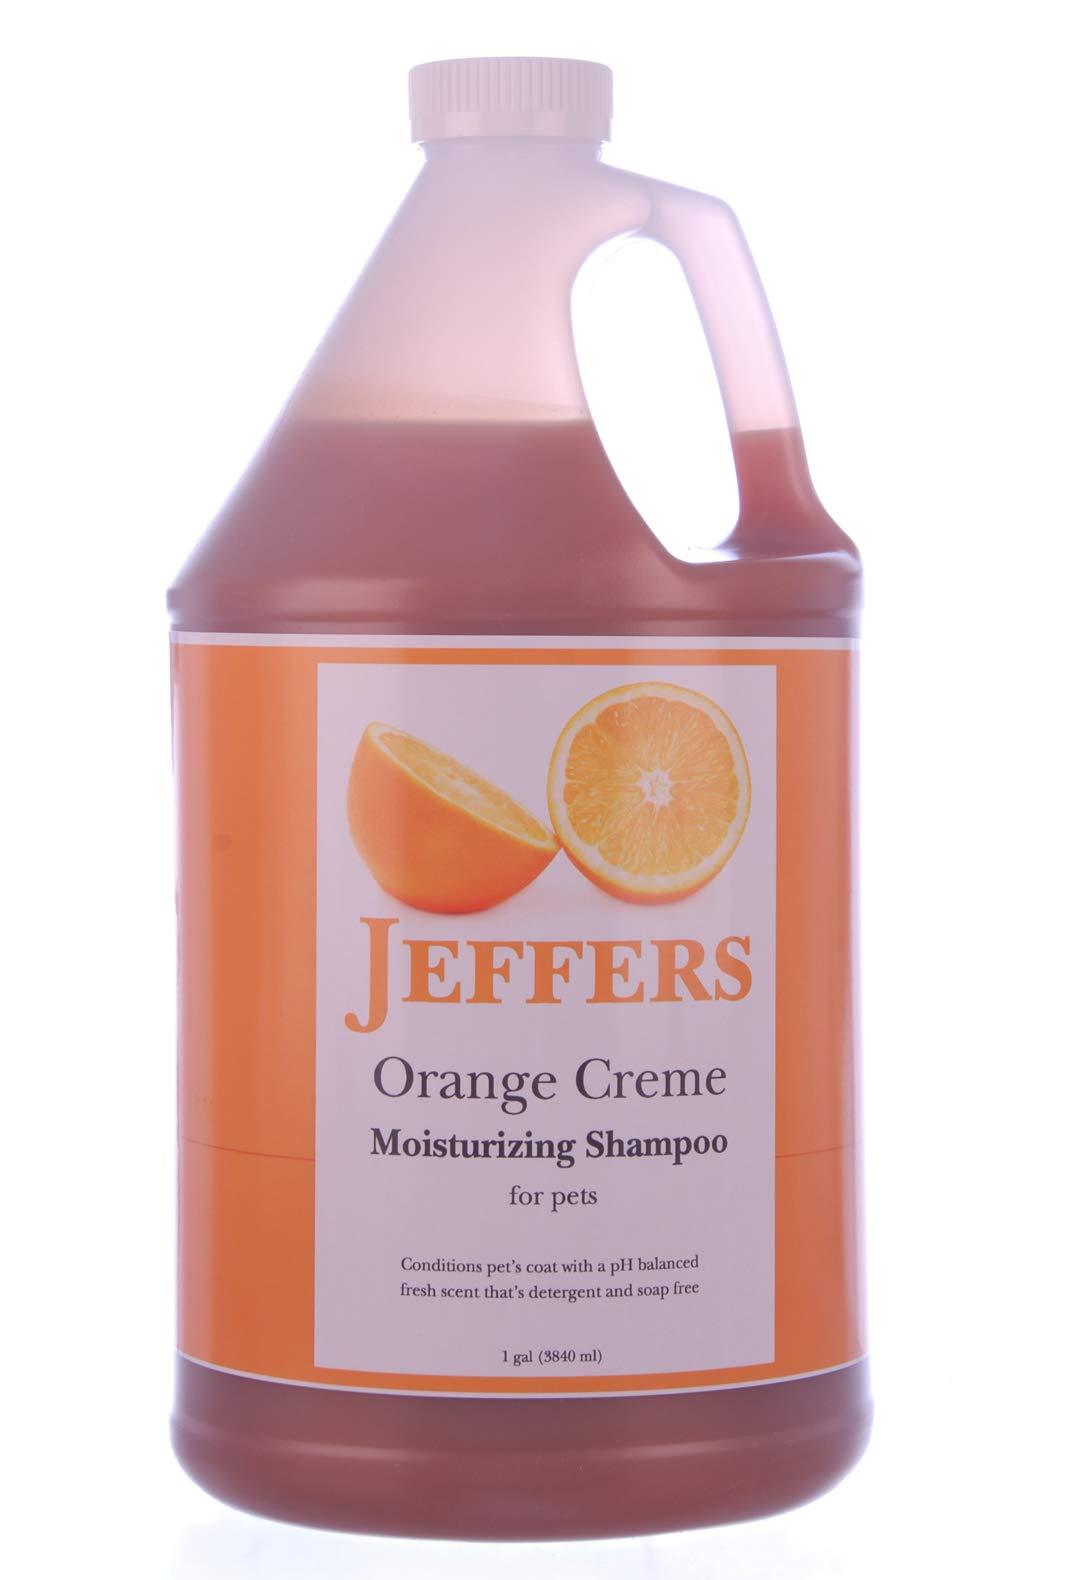 Jeffers Orange Creme Shampoo, Gallon by Jeffers